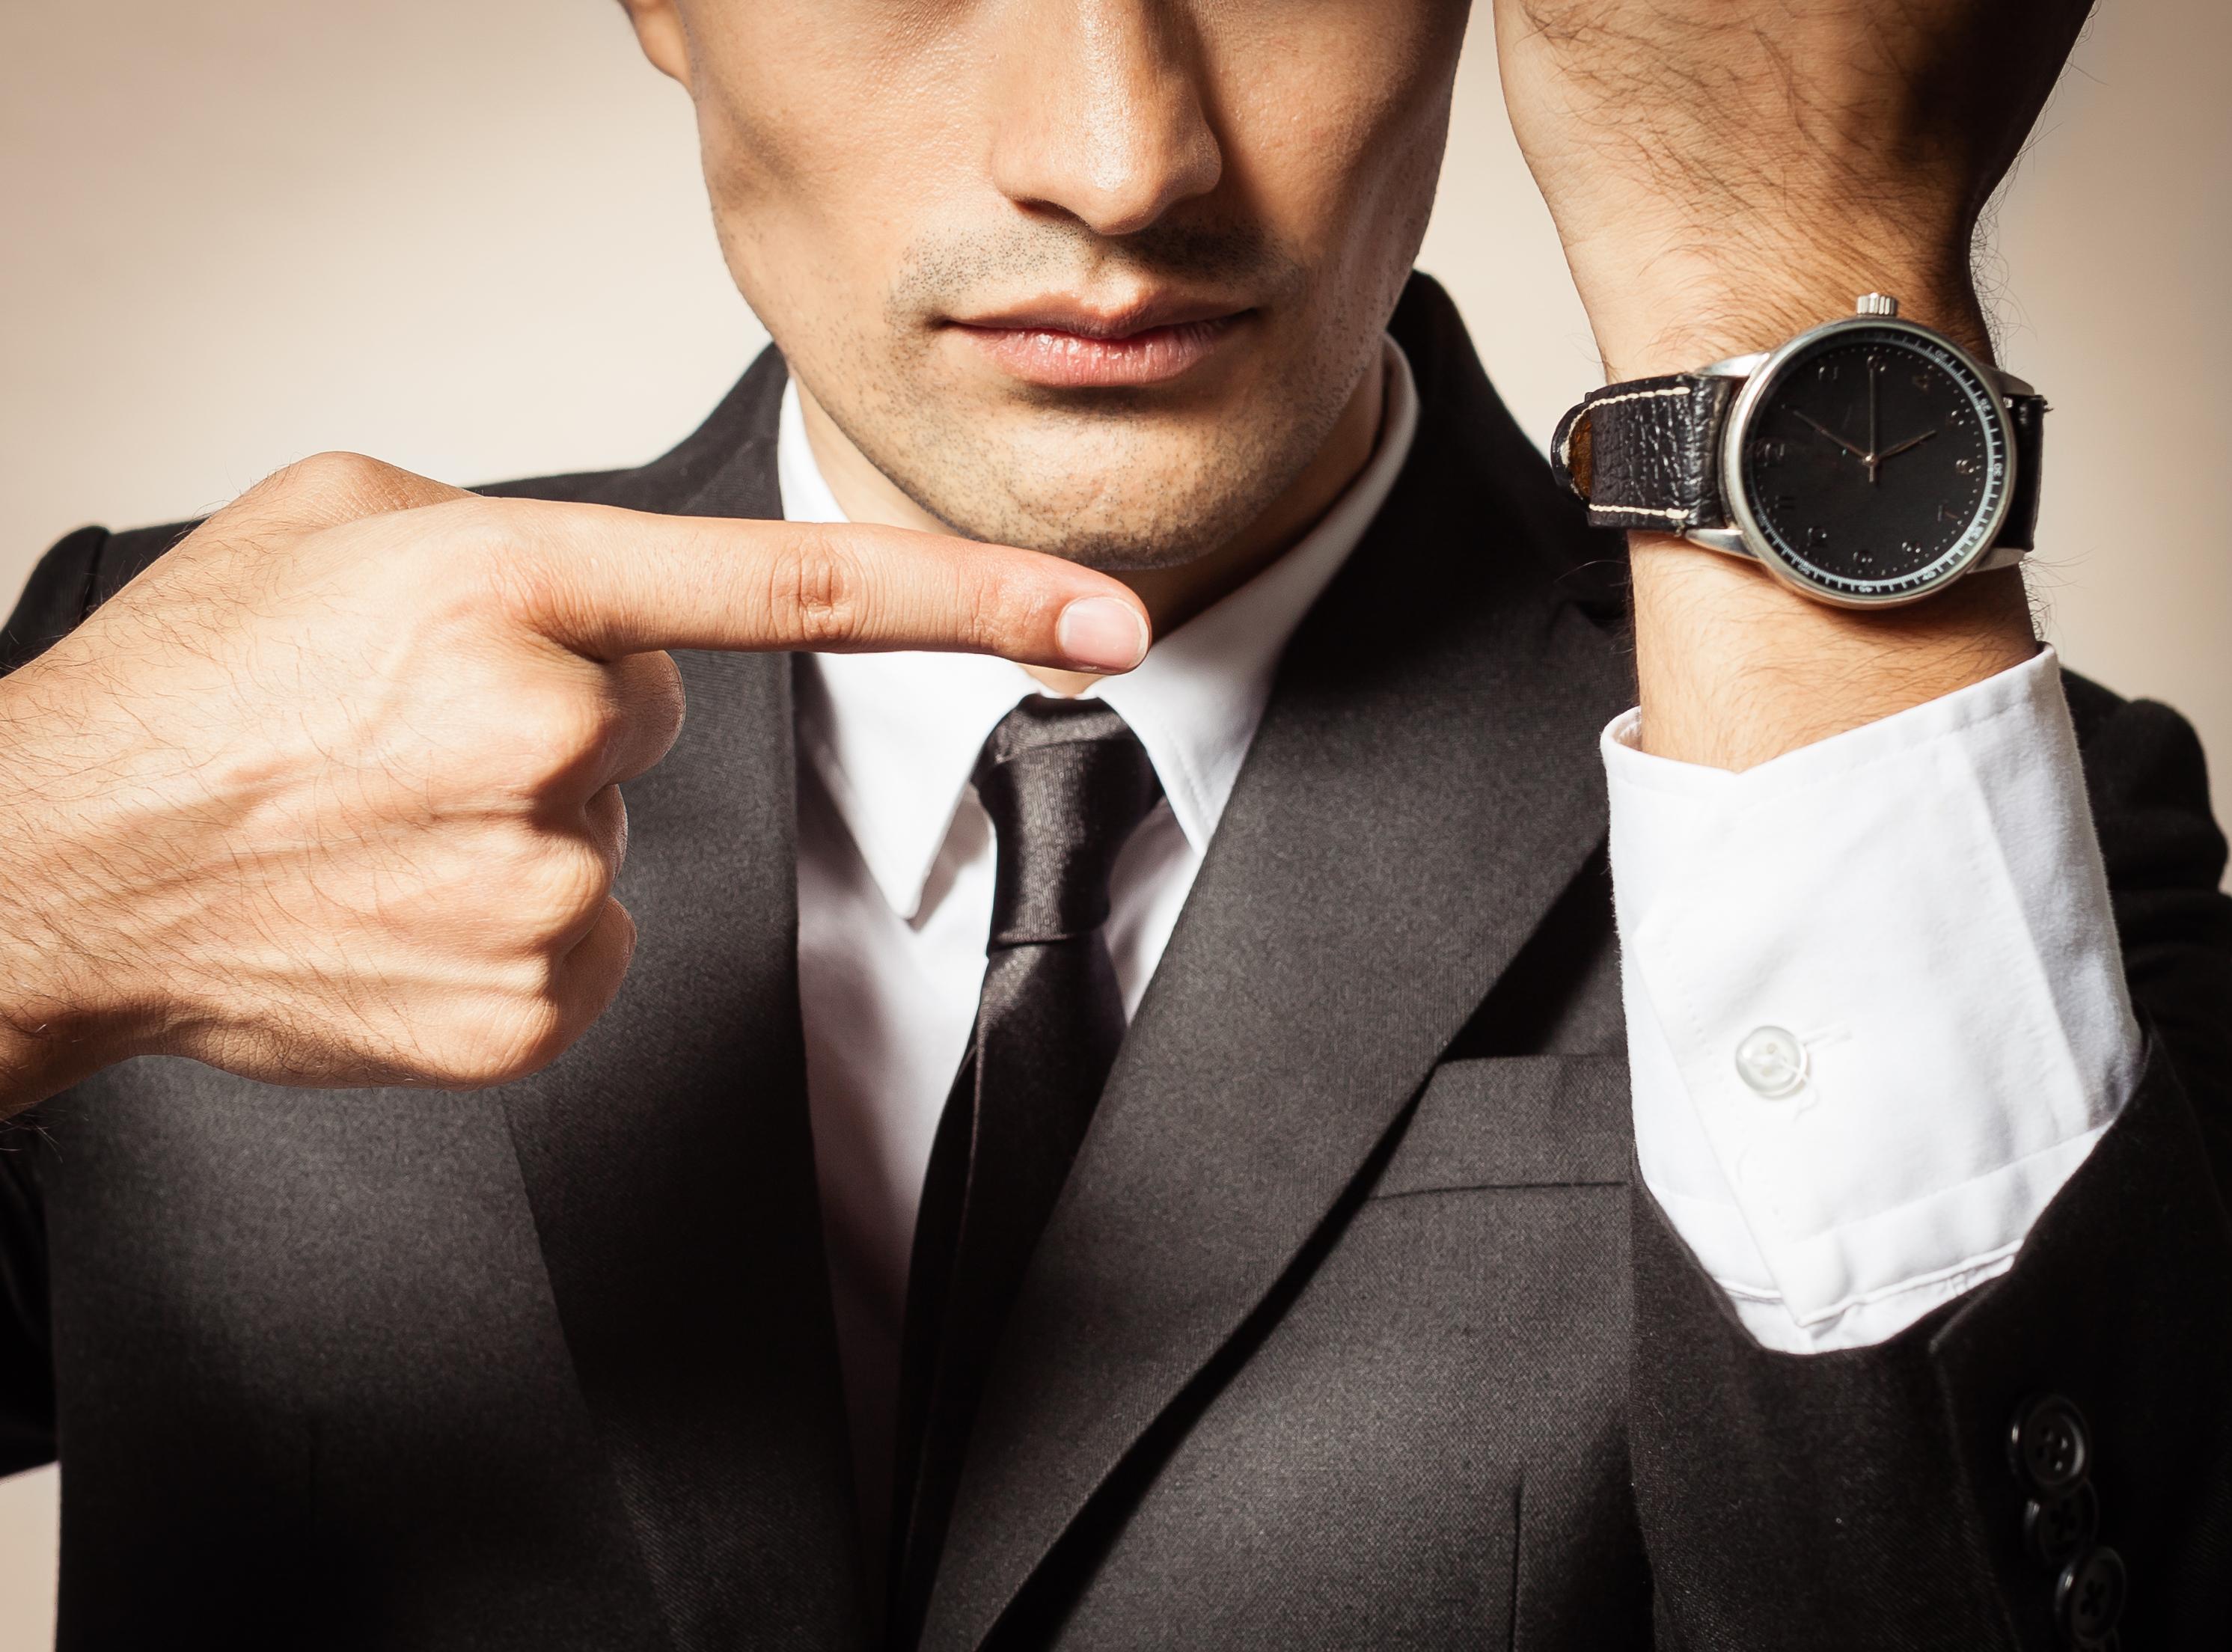 late luxury watch